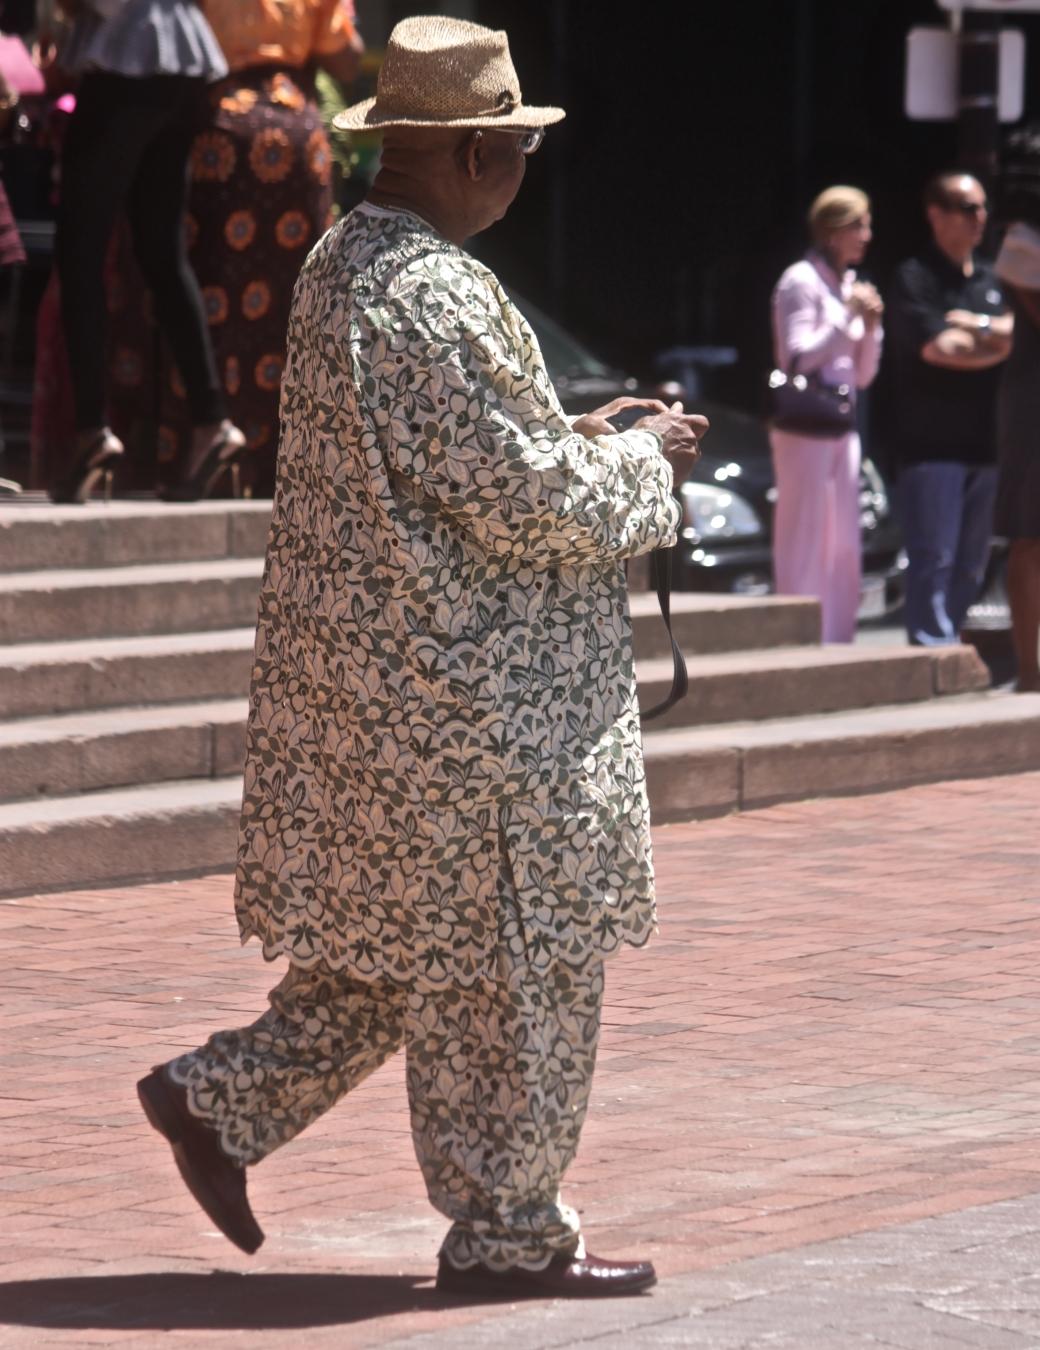 boston copley square copley square church nigerian tunic pattern pants